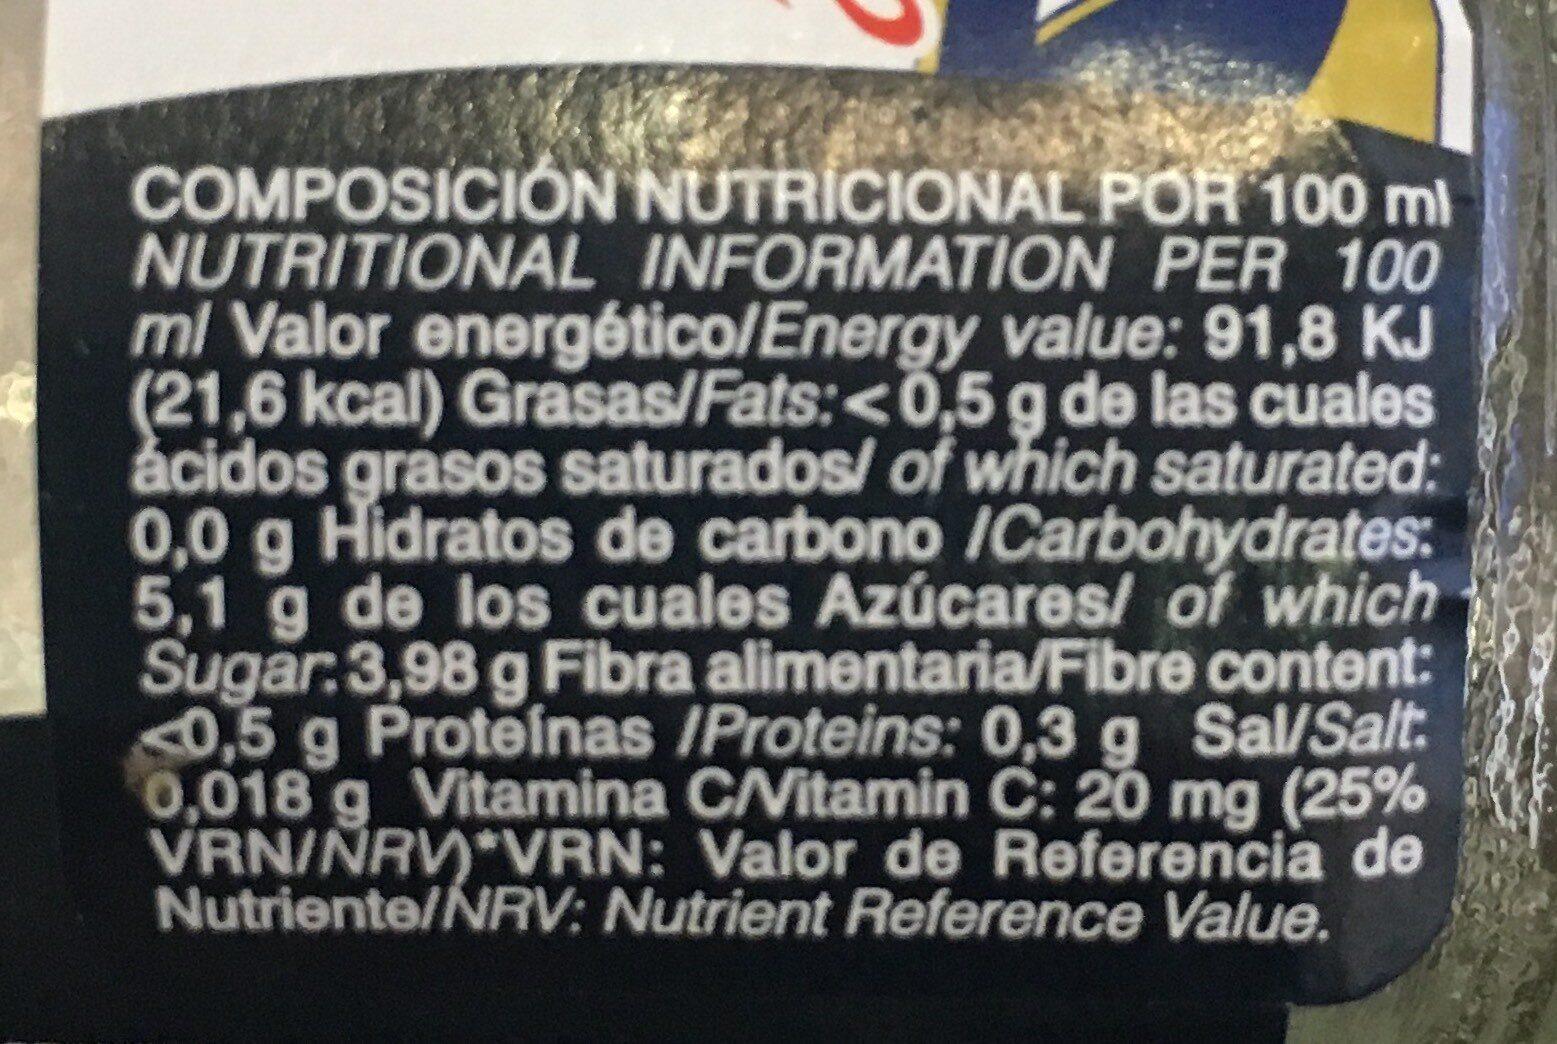 Nectar de Melocoton - Información nutricional